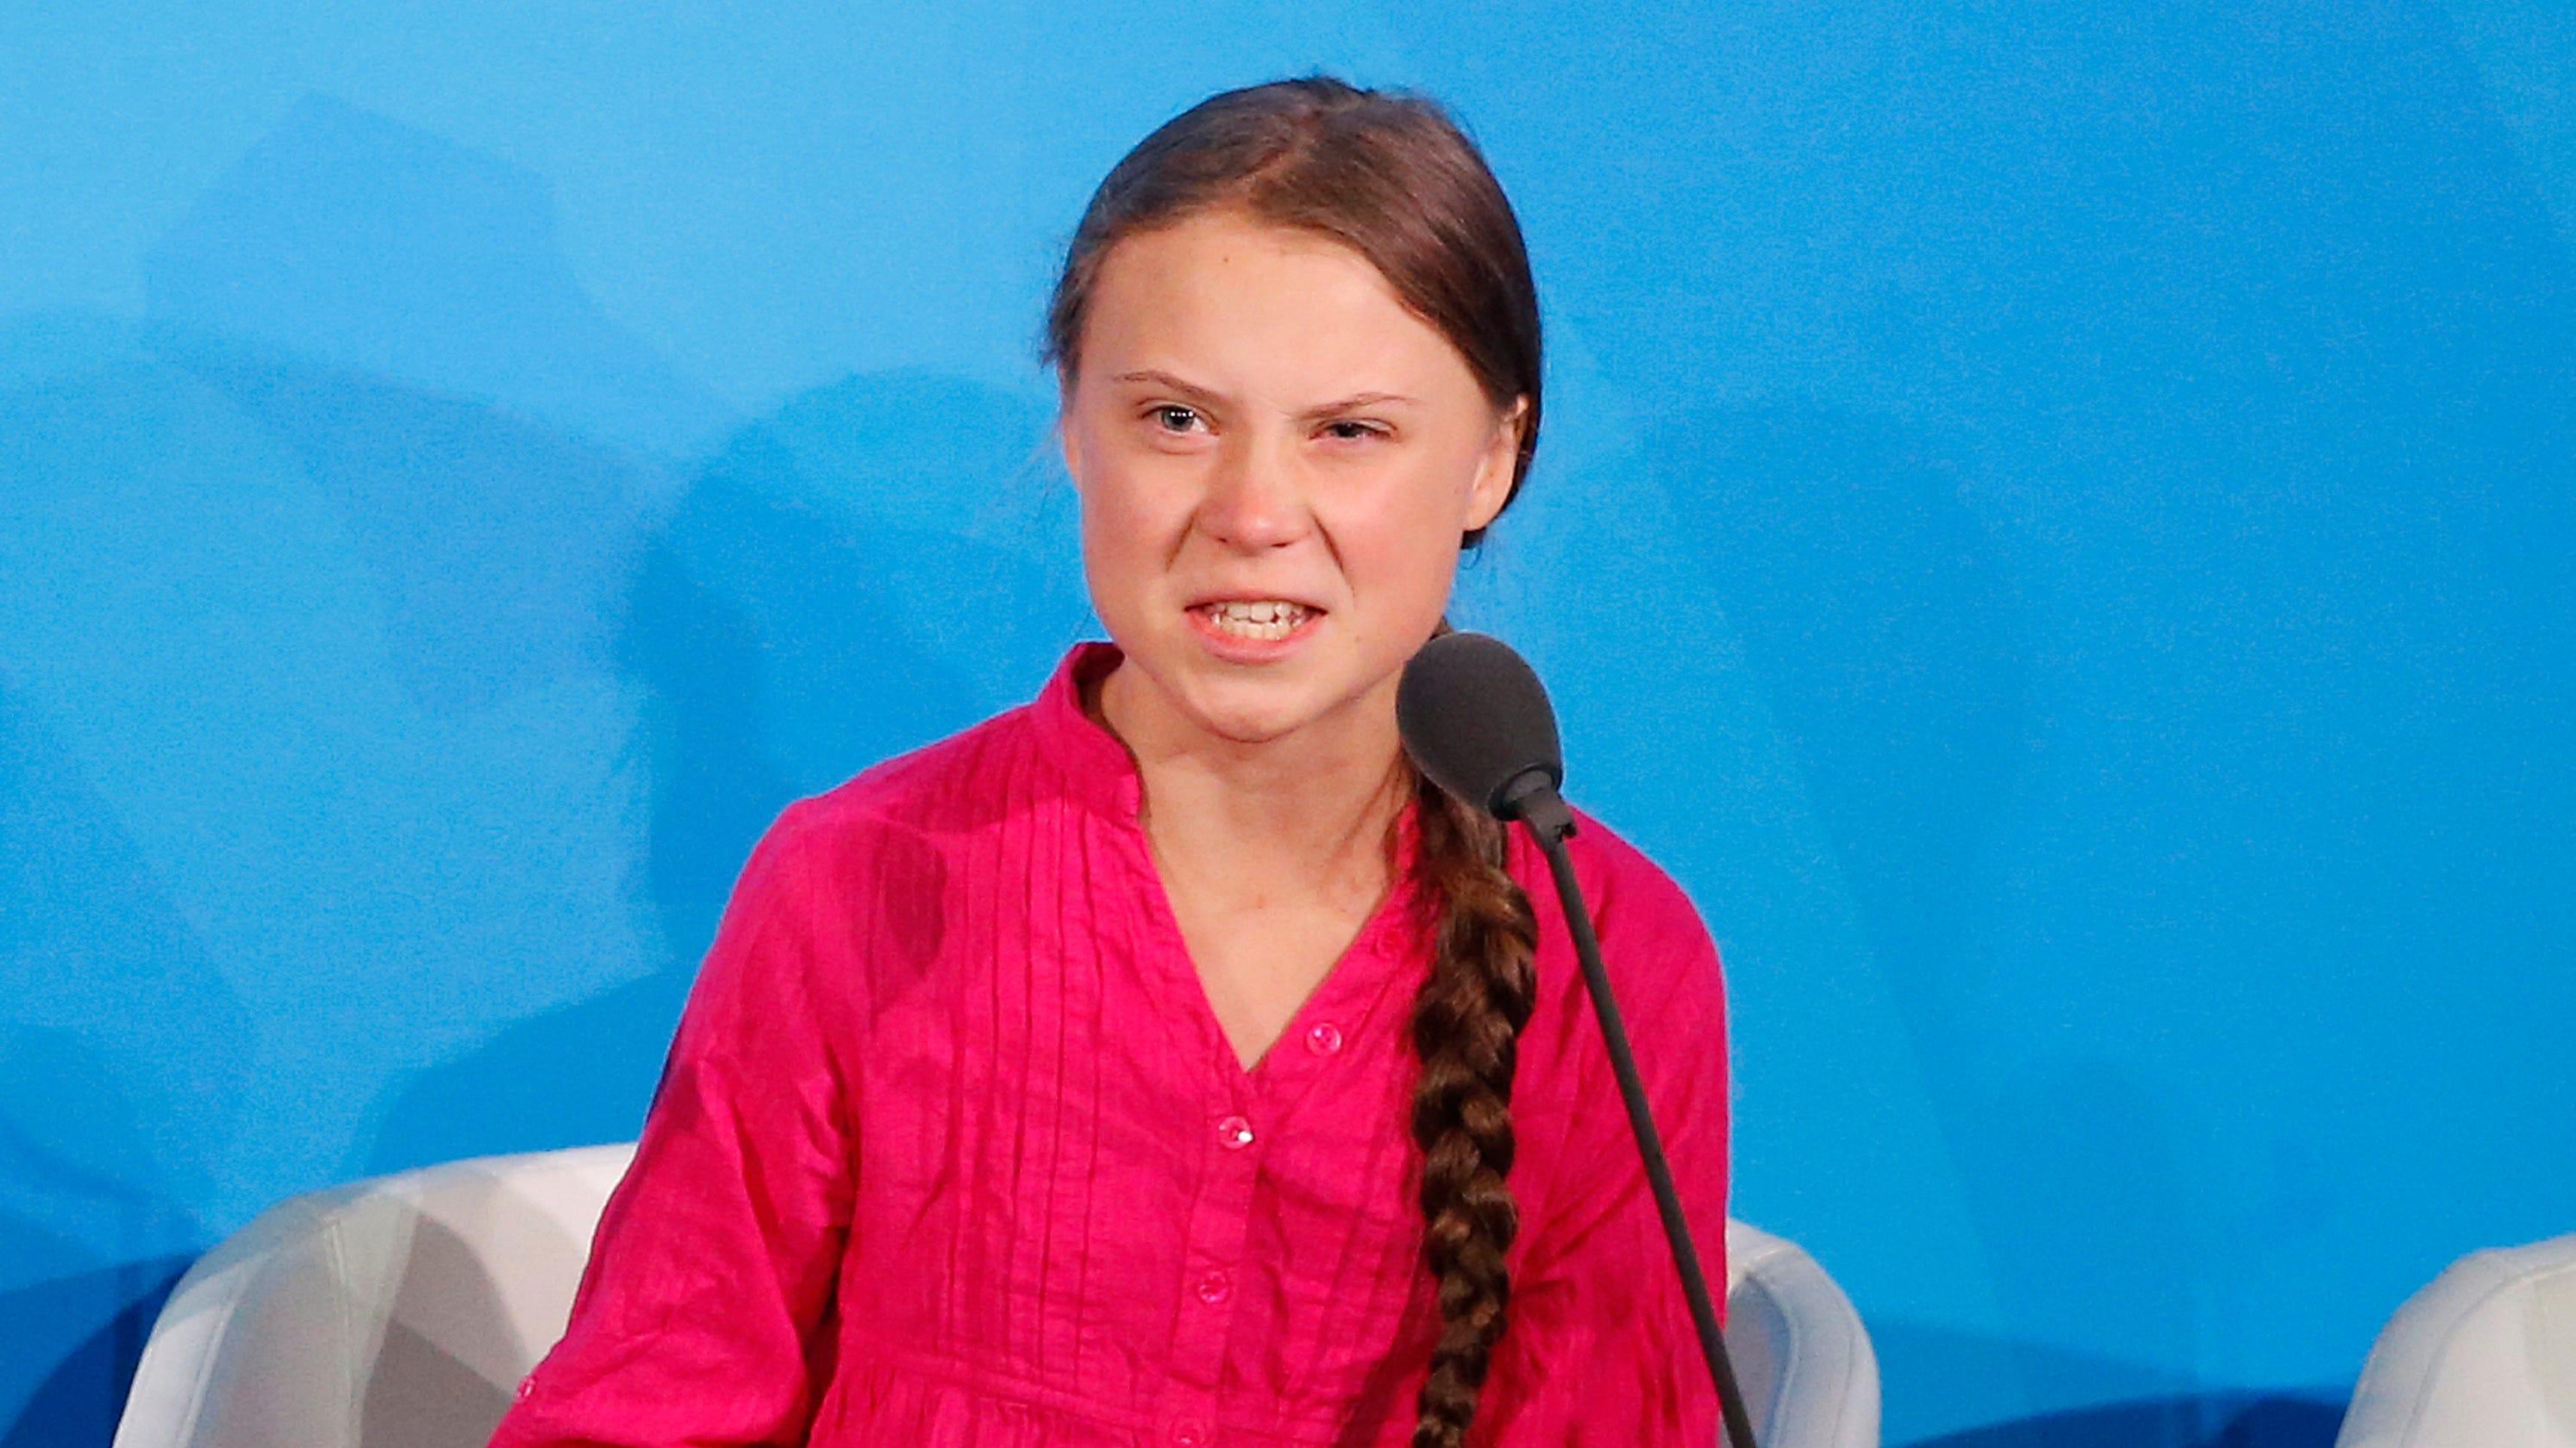 Transcript of Greta Thunberg speech on climate change ...